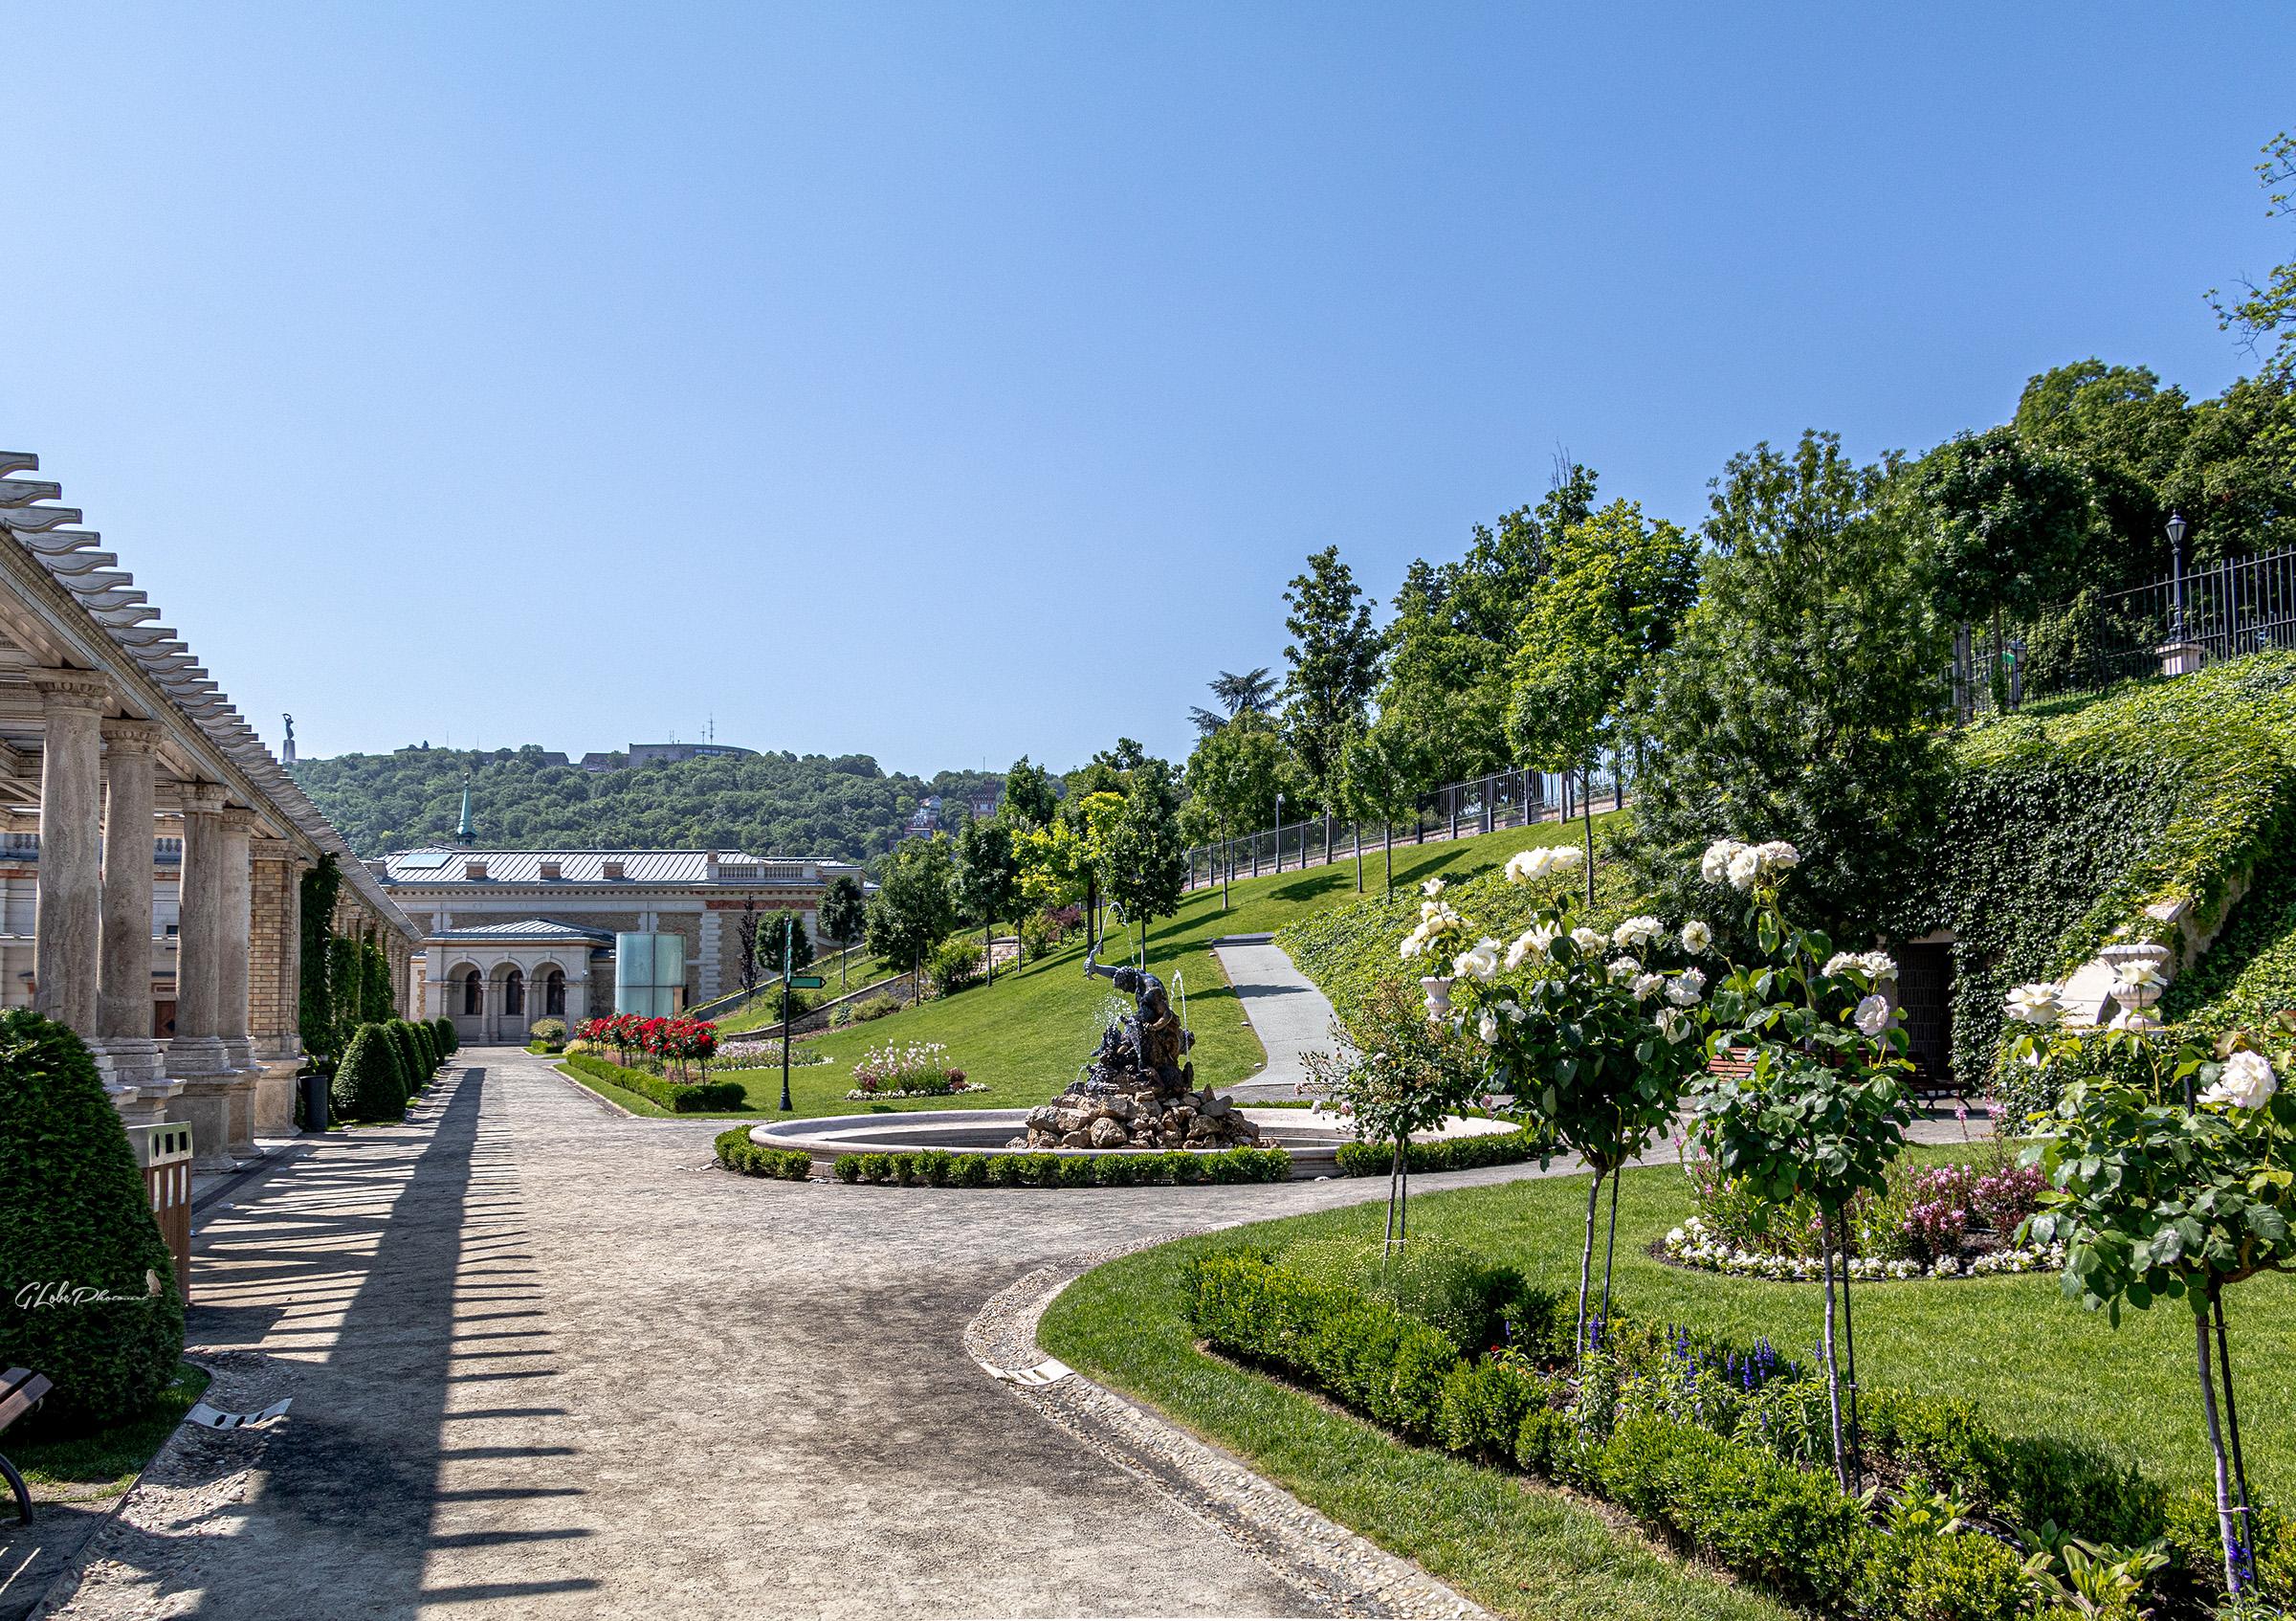 Royal Garden Pavilion